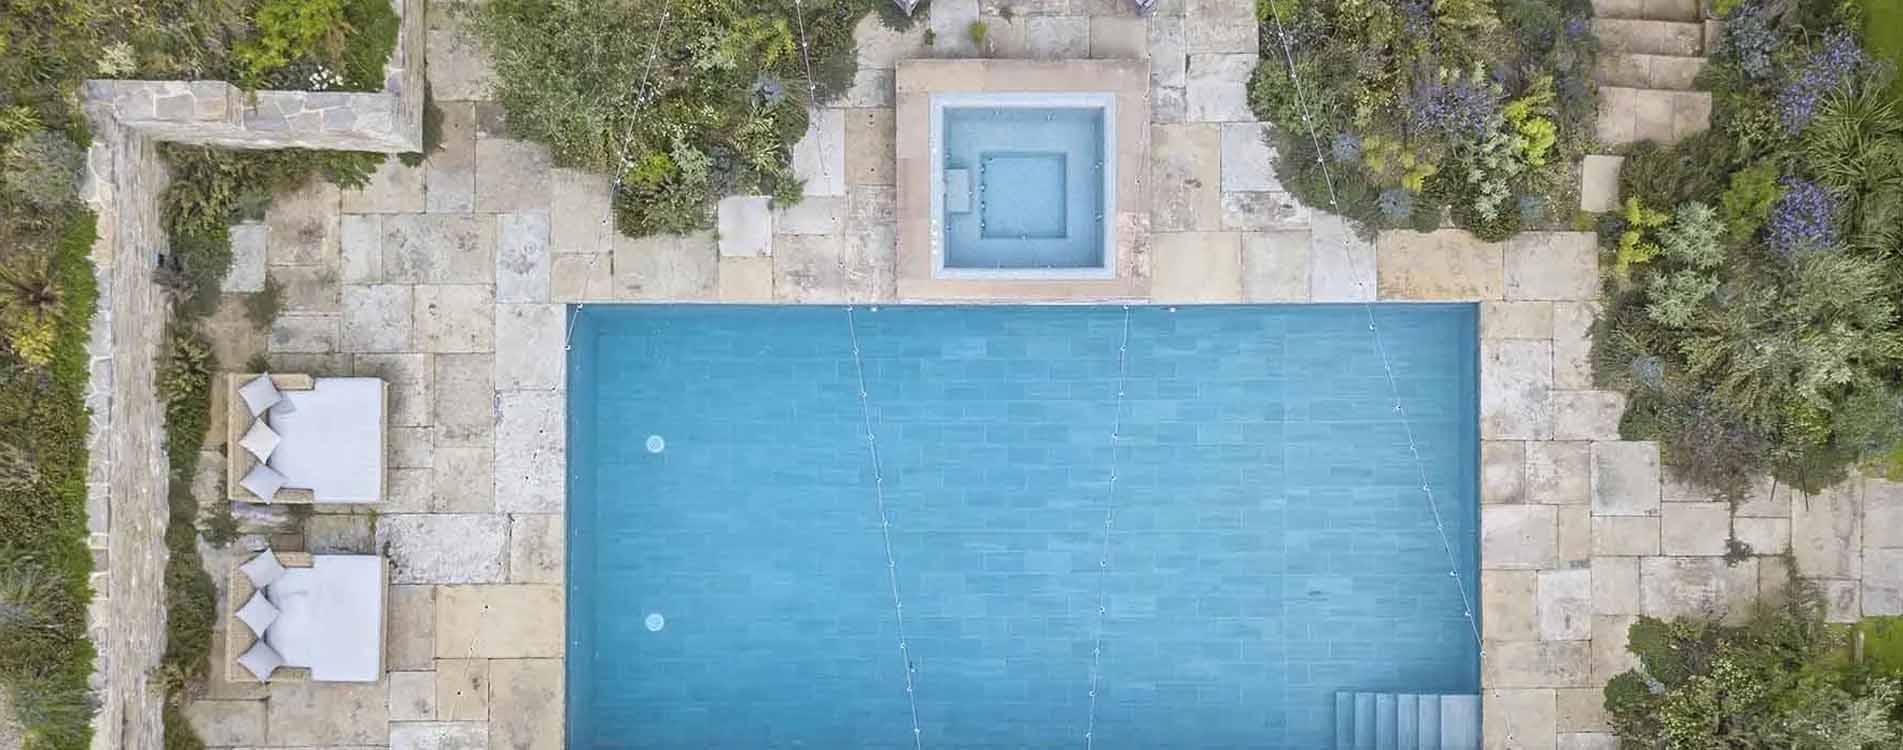 Indoor Pool Builds Henley | Deep End Pools